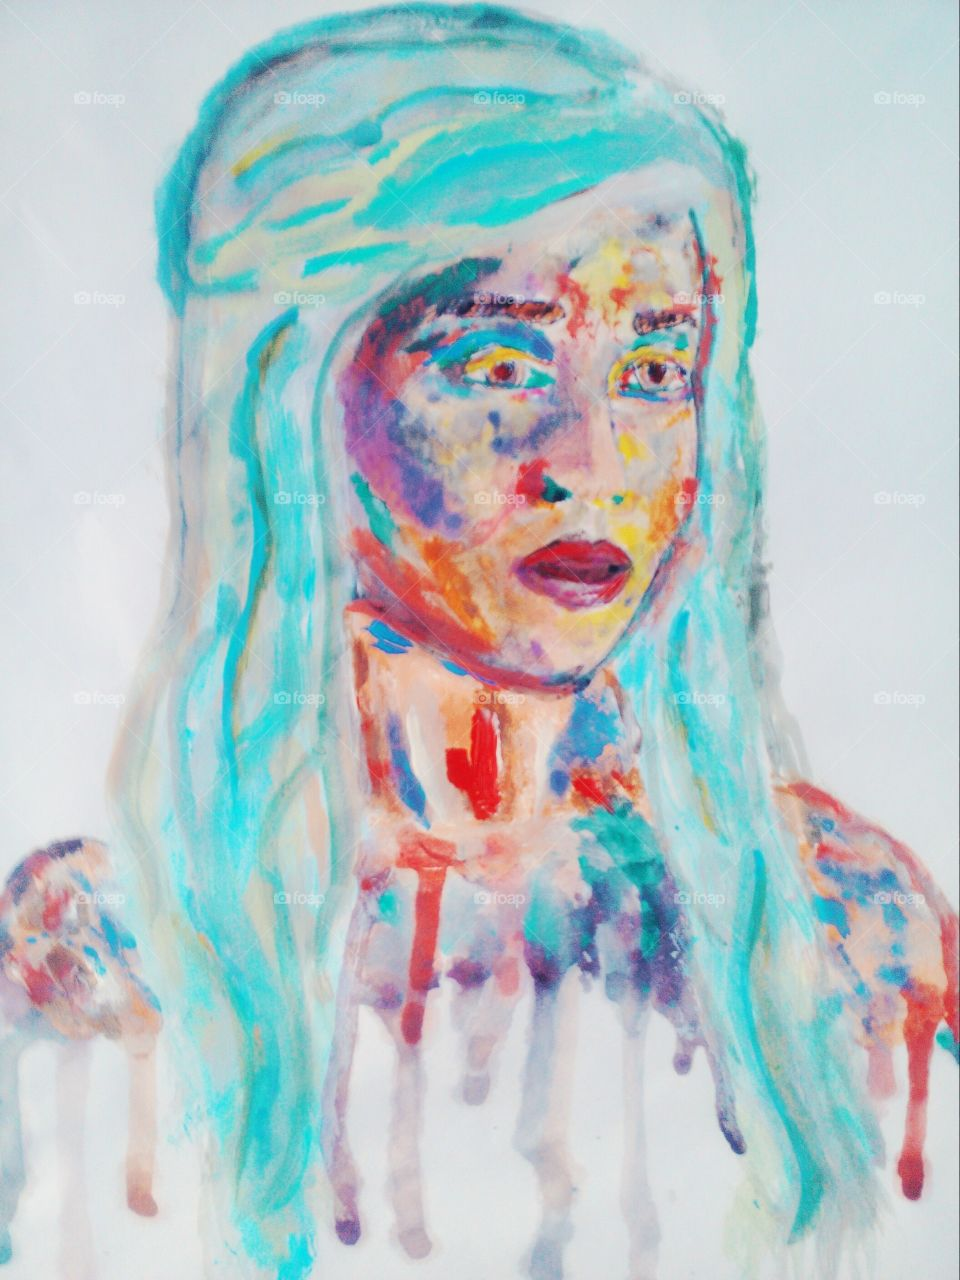 Art, Artistic, Painting, Creativity, Illustration